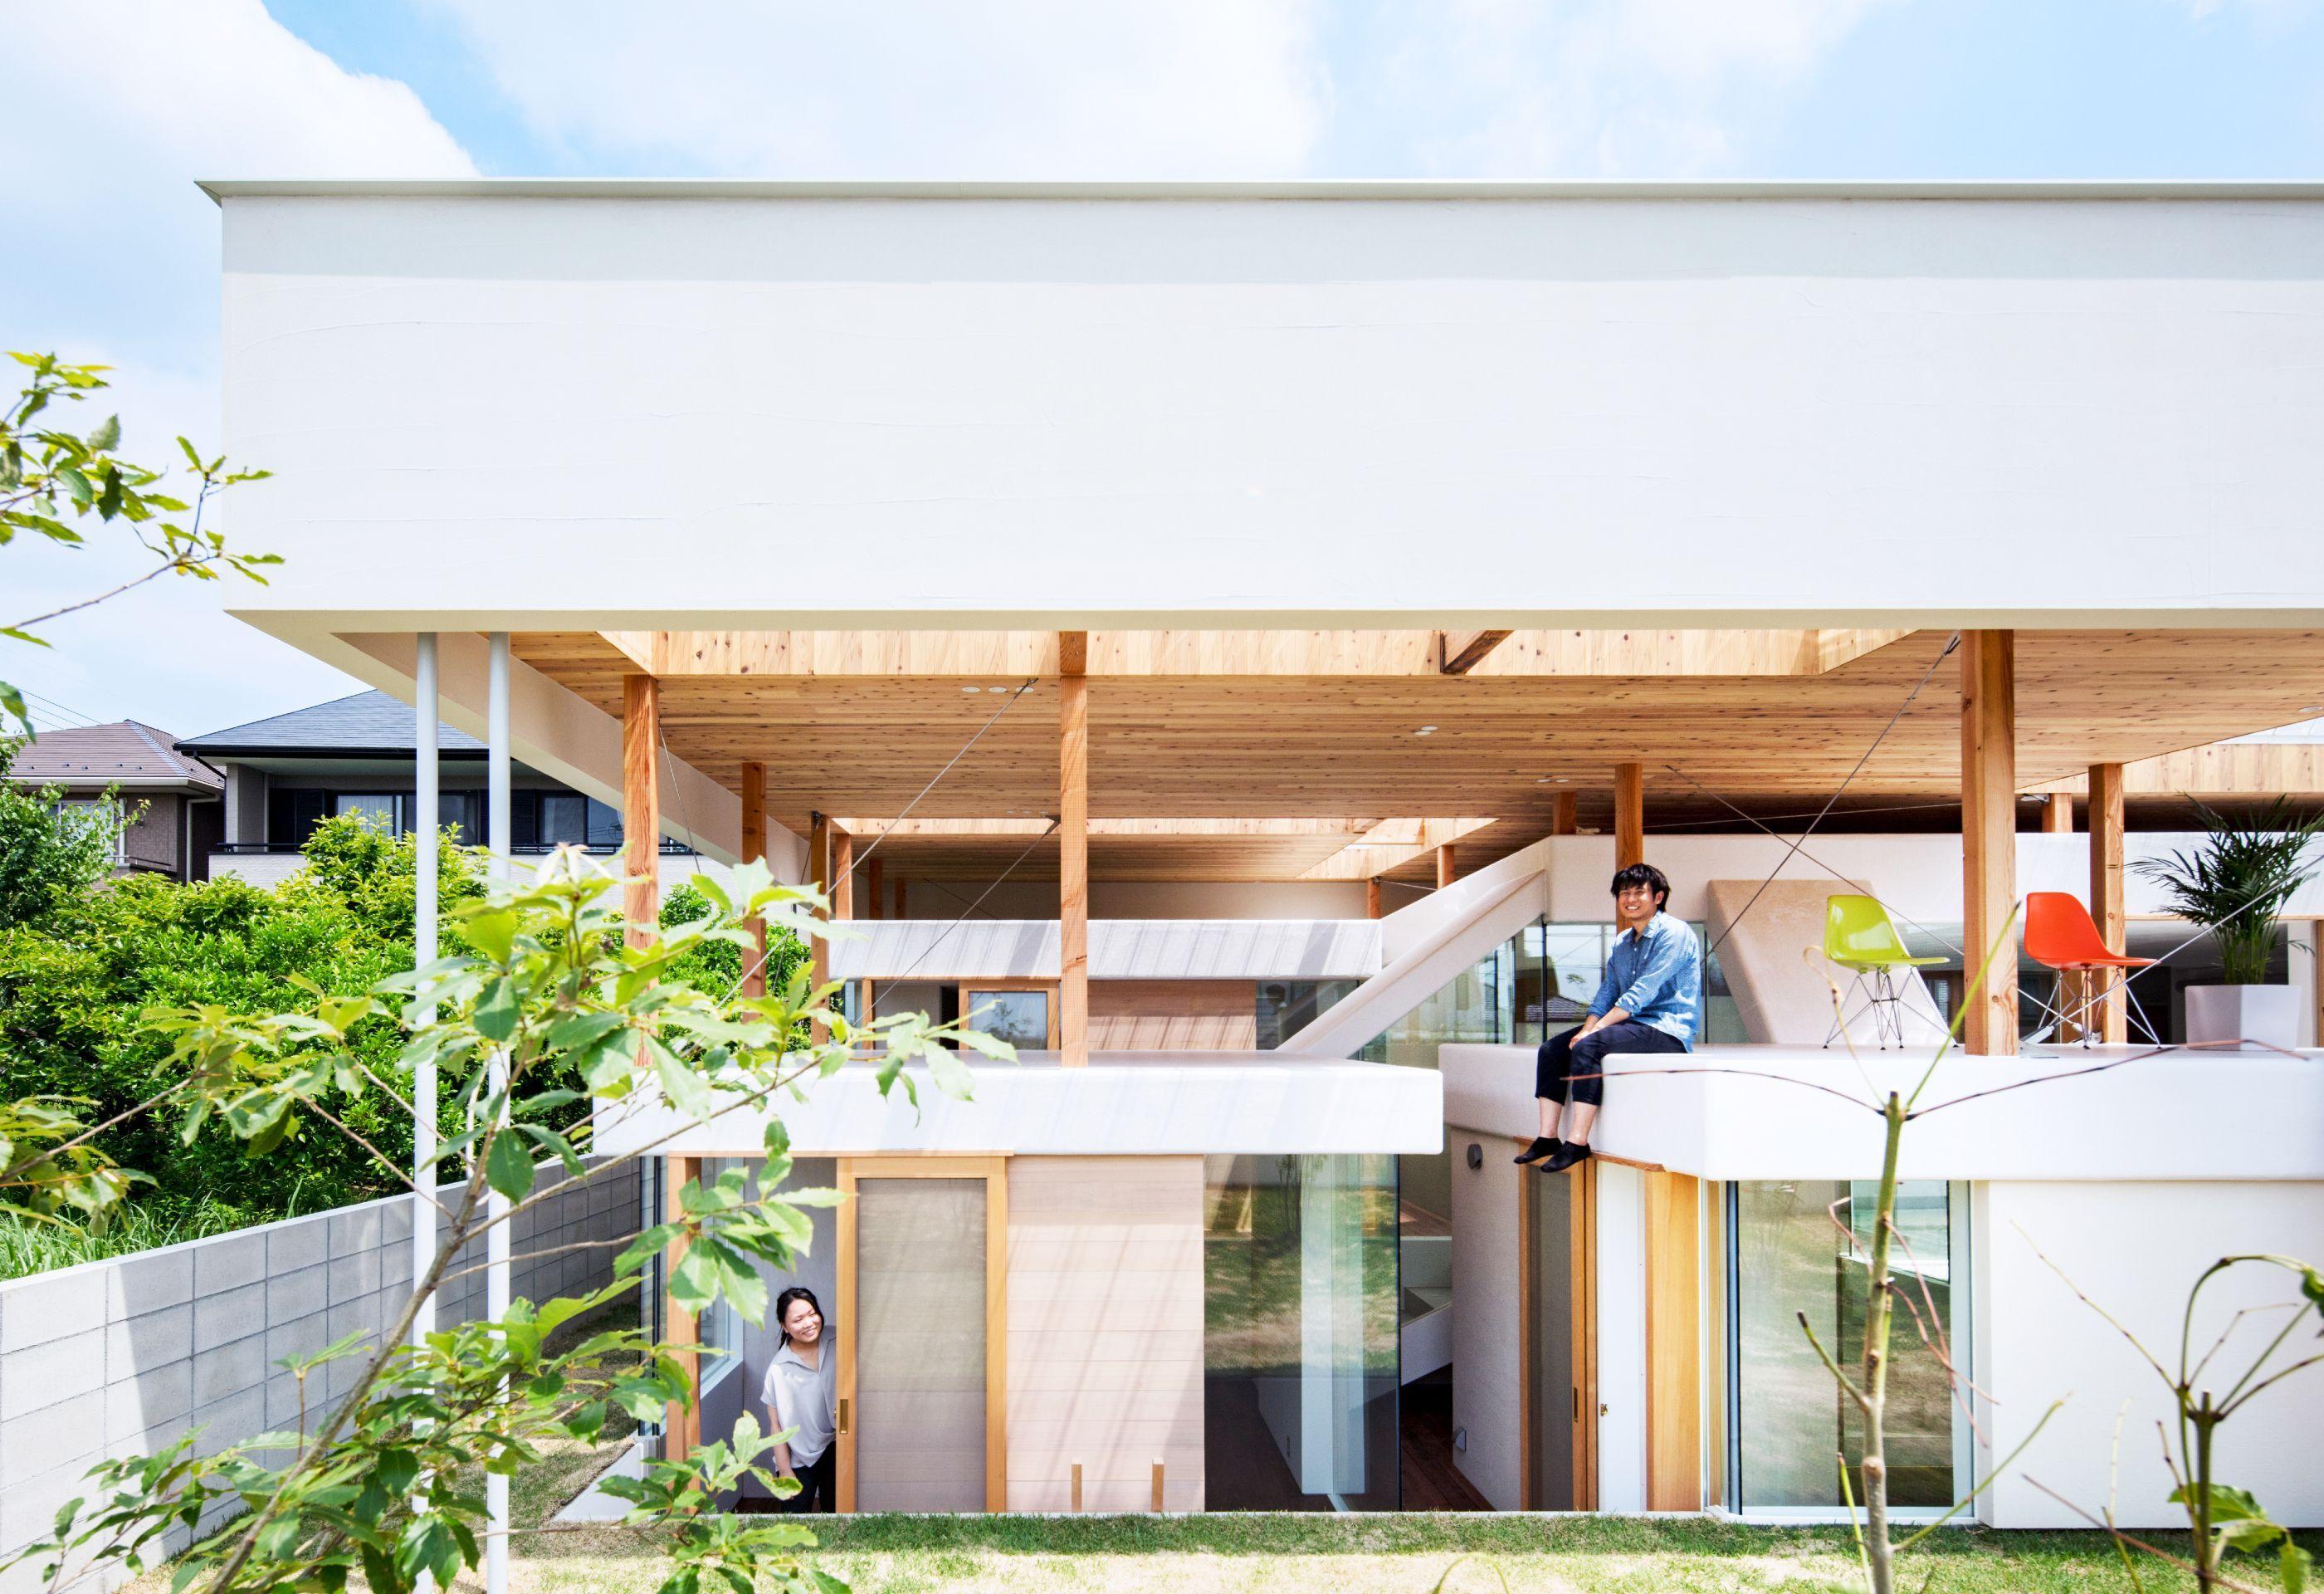 Atelier Lx 愛知 岐阜 三重 静岡を中心とした住宅 商業の一級